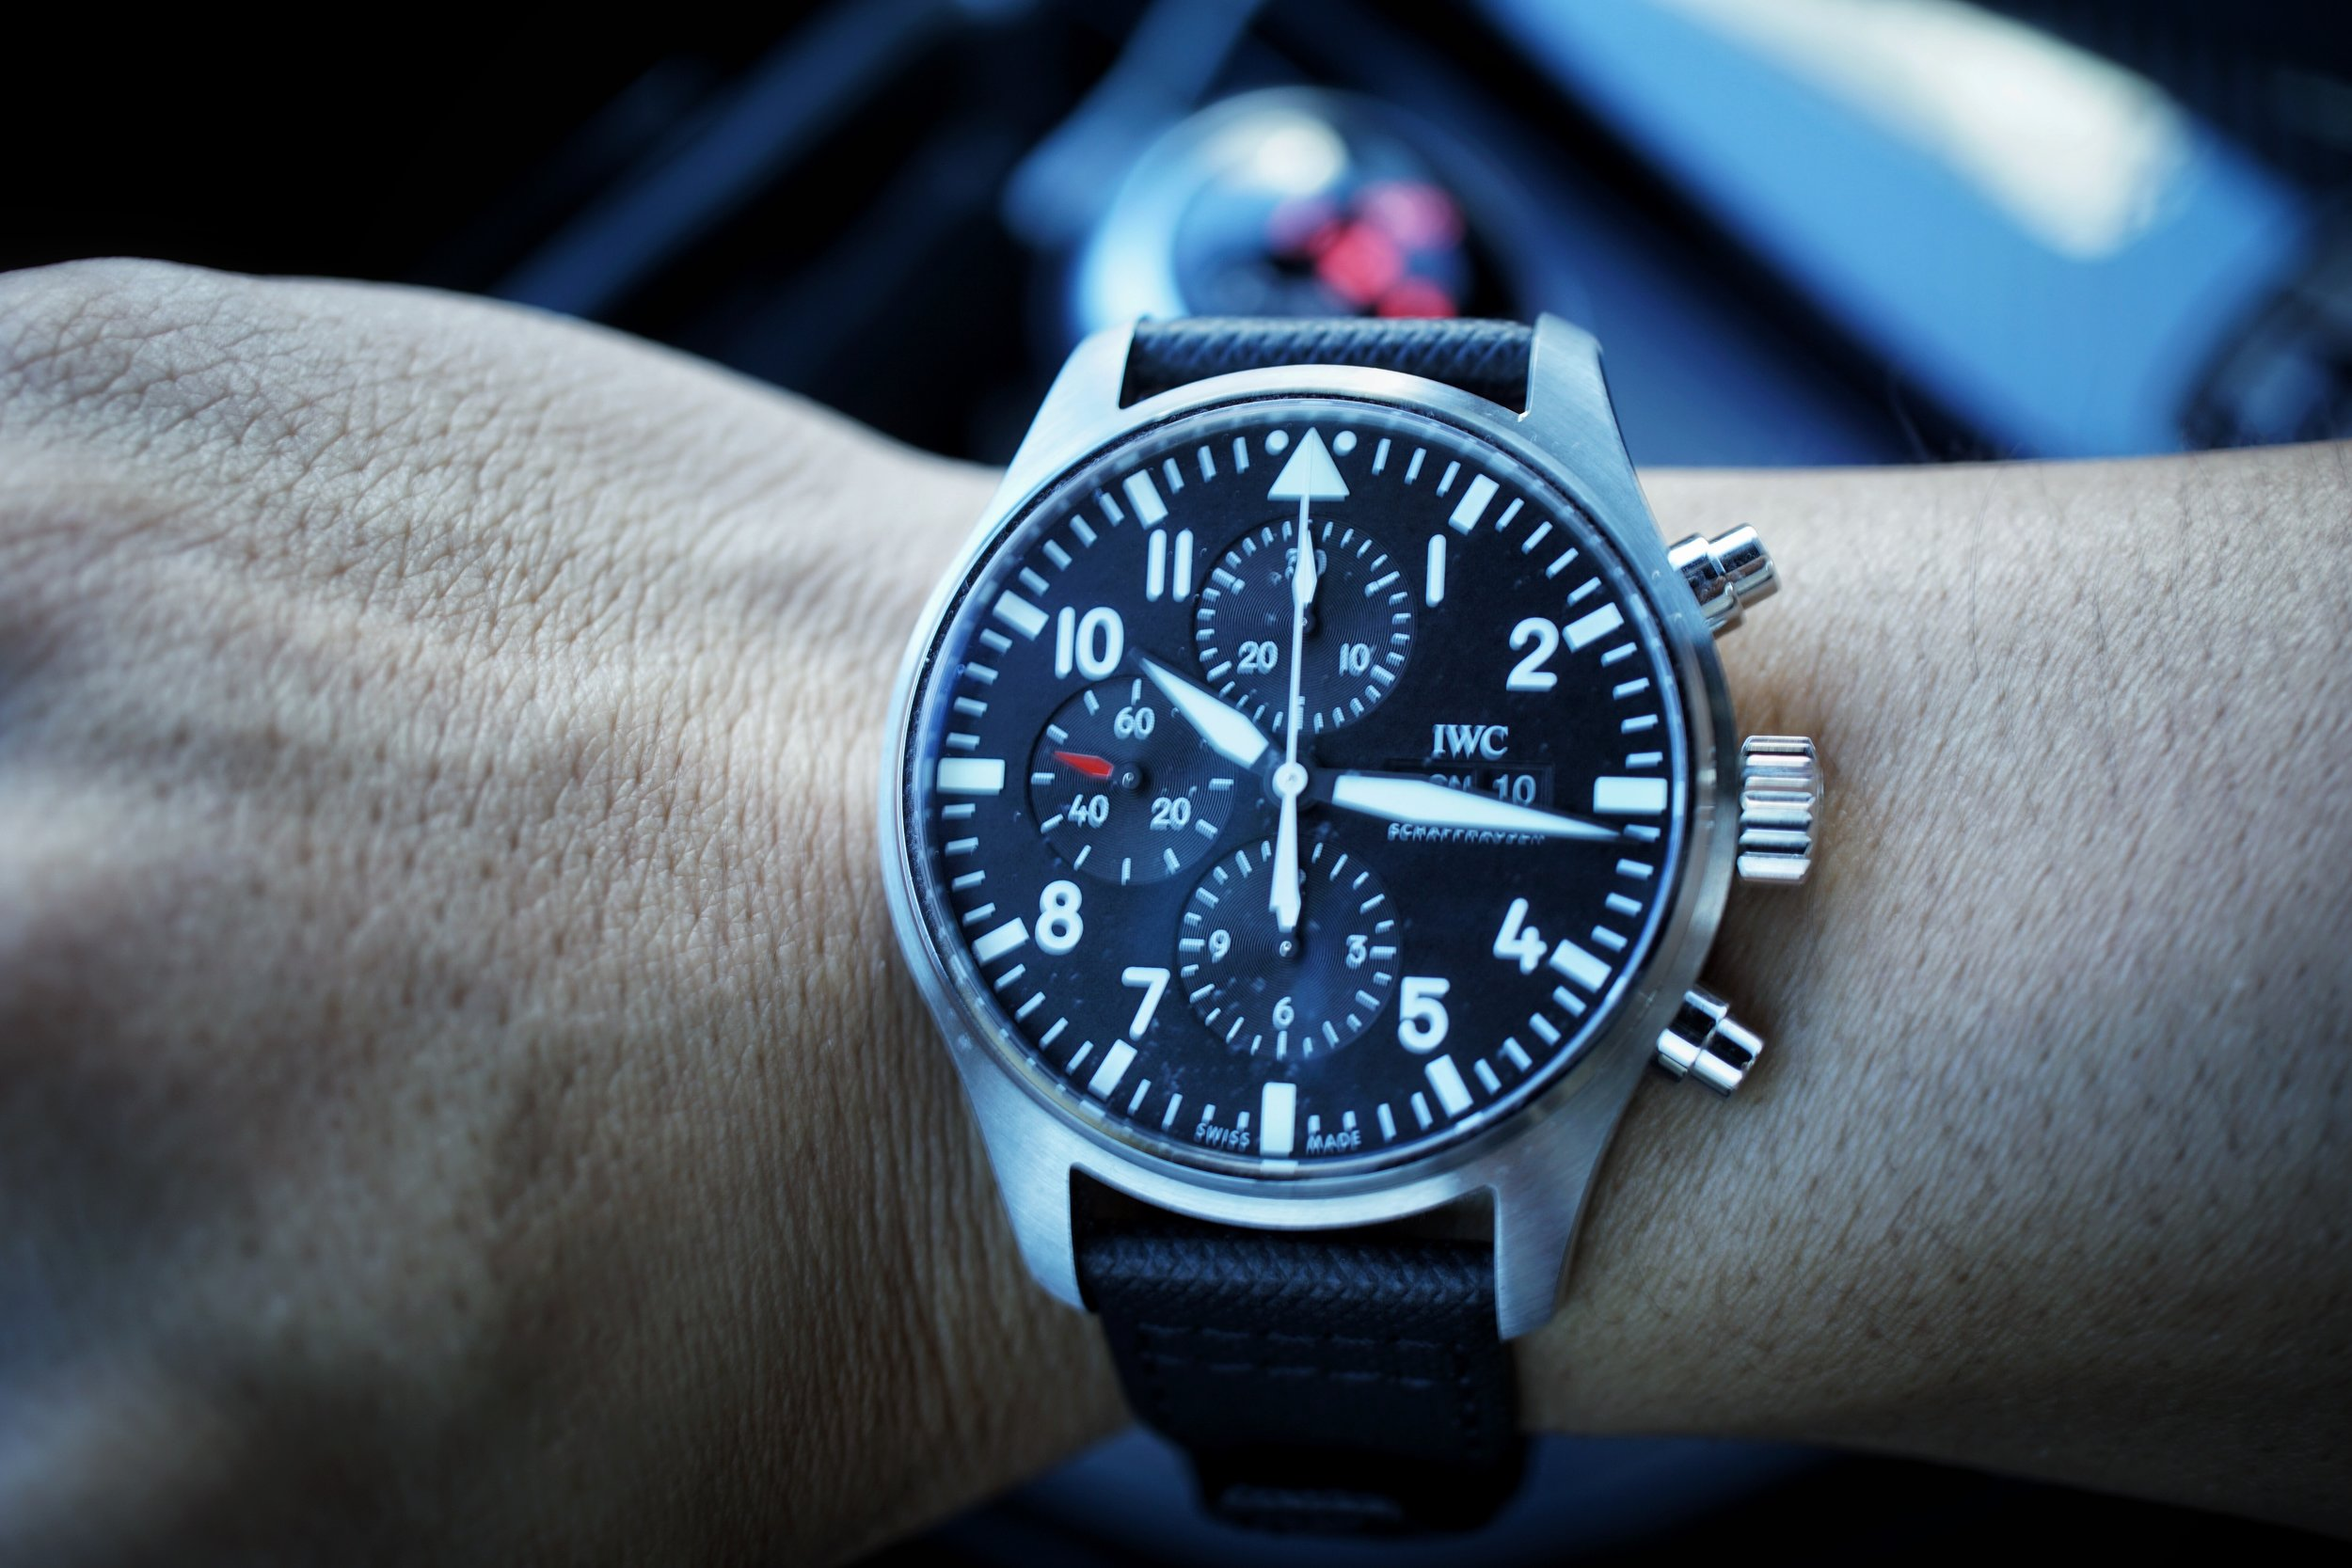 IWC Pilot's Watch Chronograph ref 3777-09